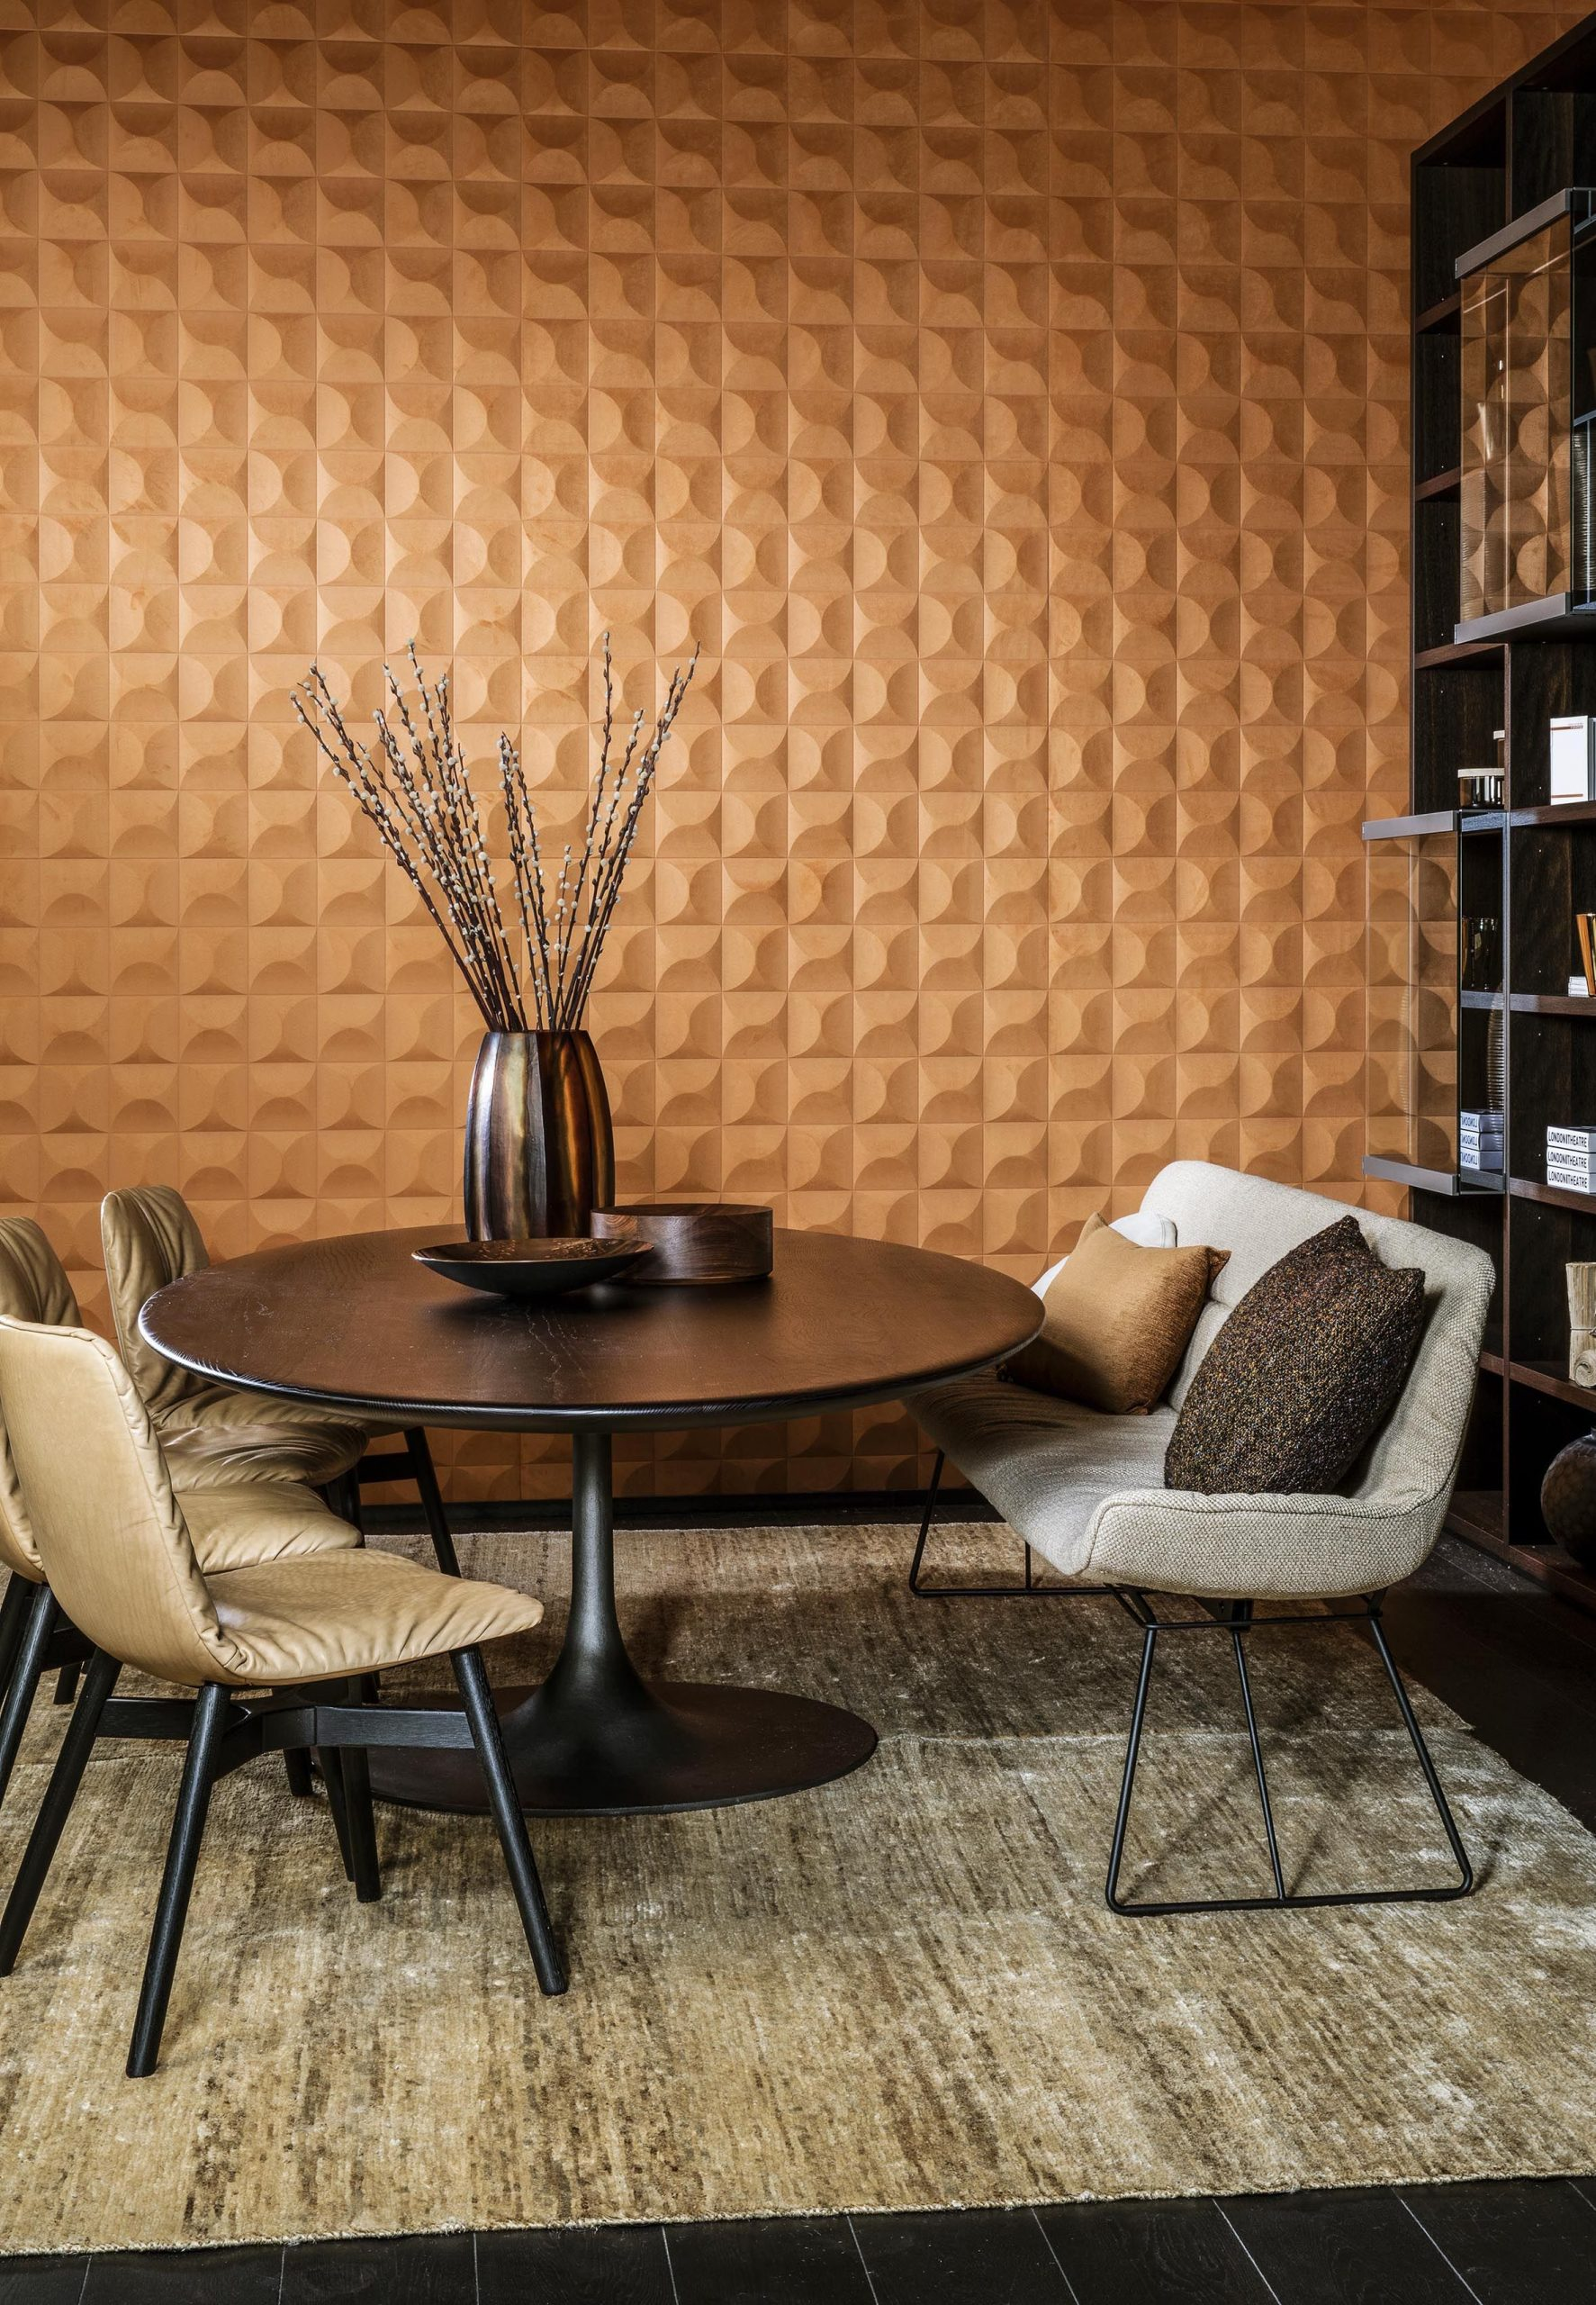 Spectra Carrelage Wallpaper (Sp61513) | Wall Coverings ... pour Carrelage Arte Design